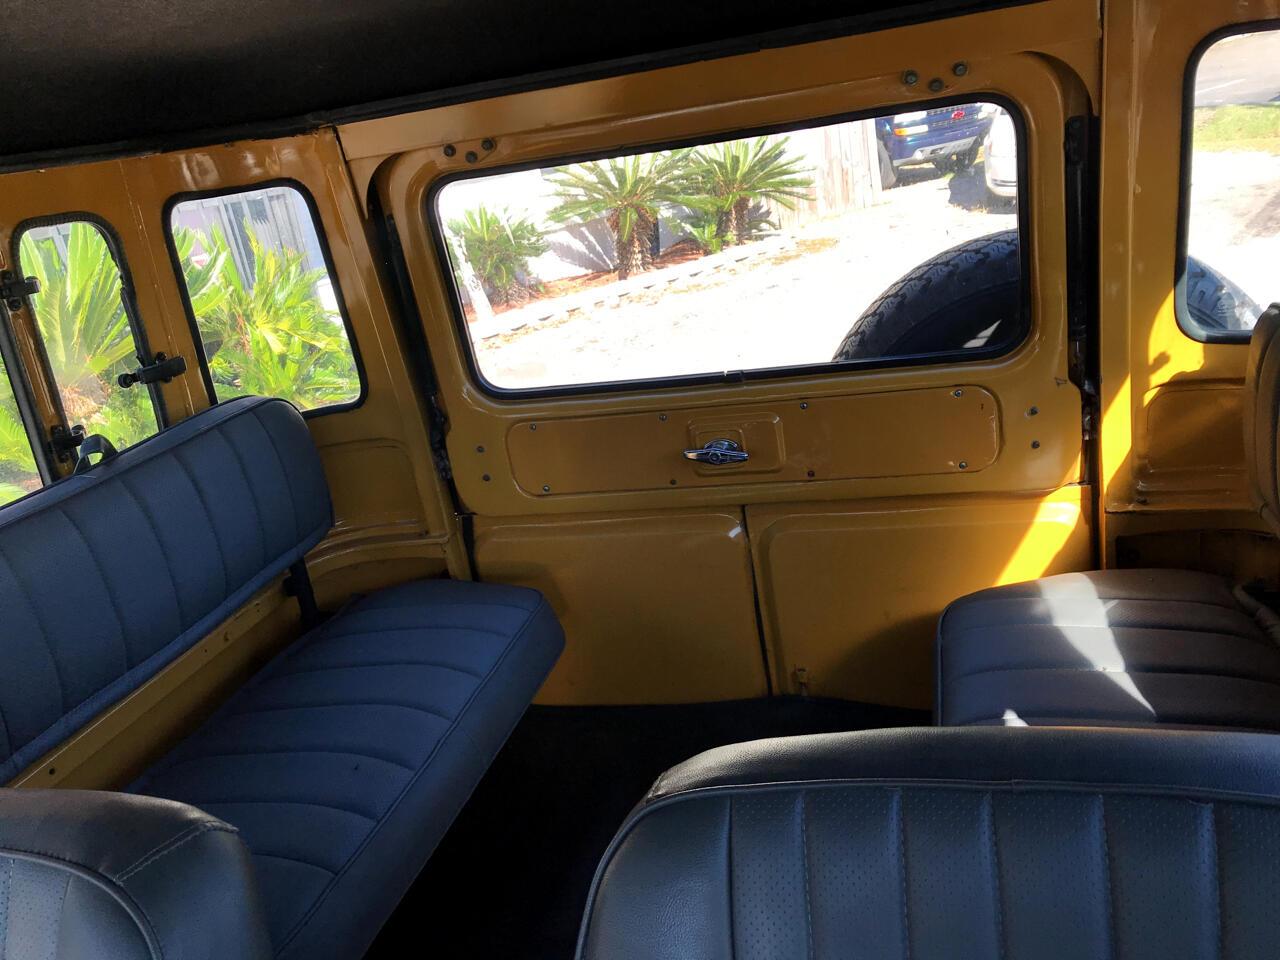 1981 Toyota Land Cruiser 4dr Wagon 4-Spd